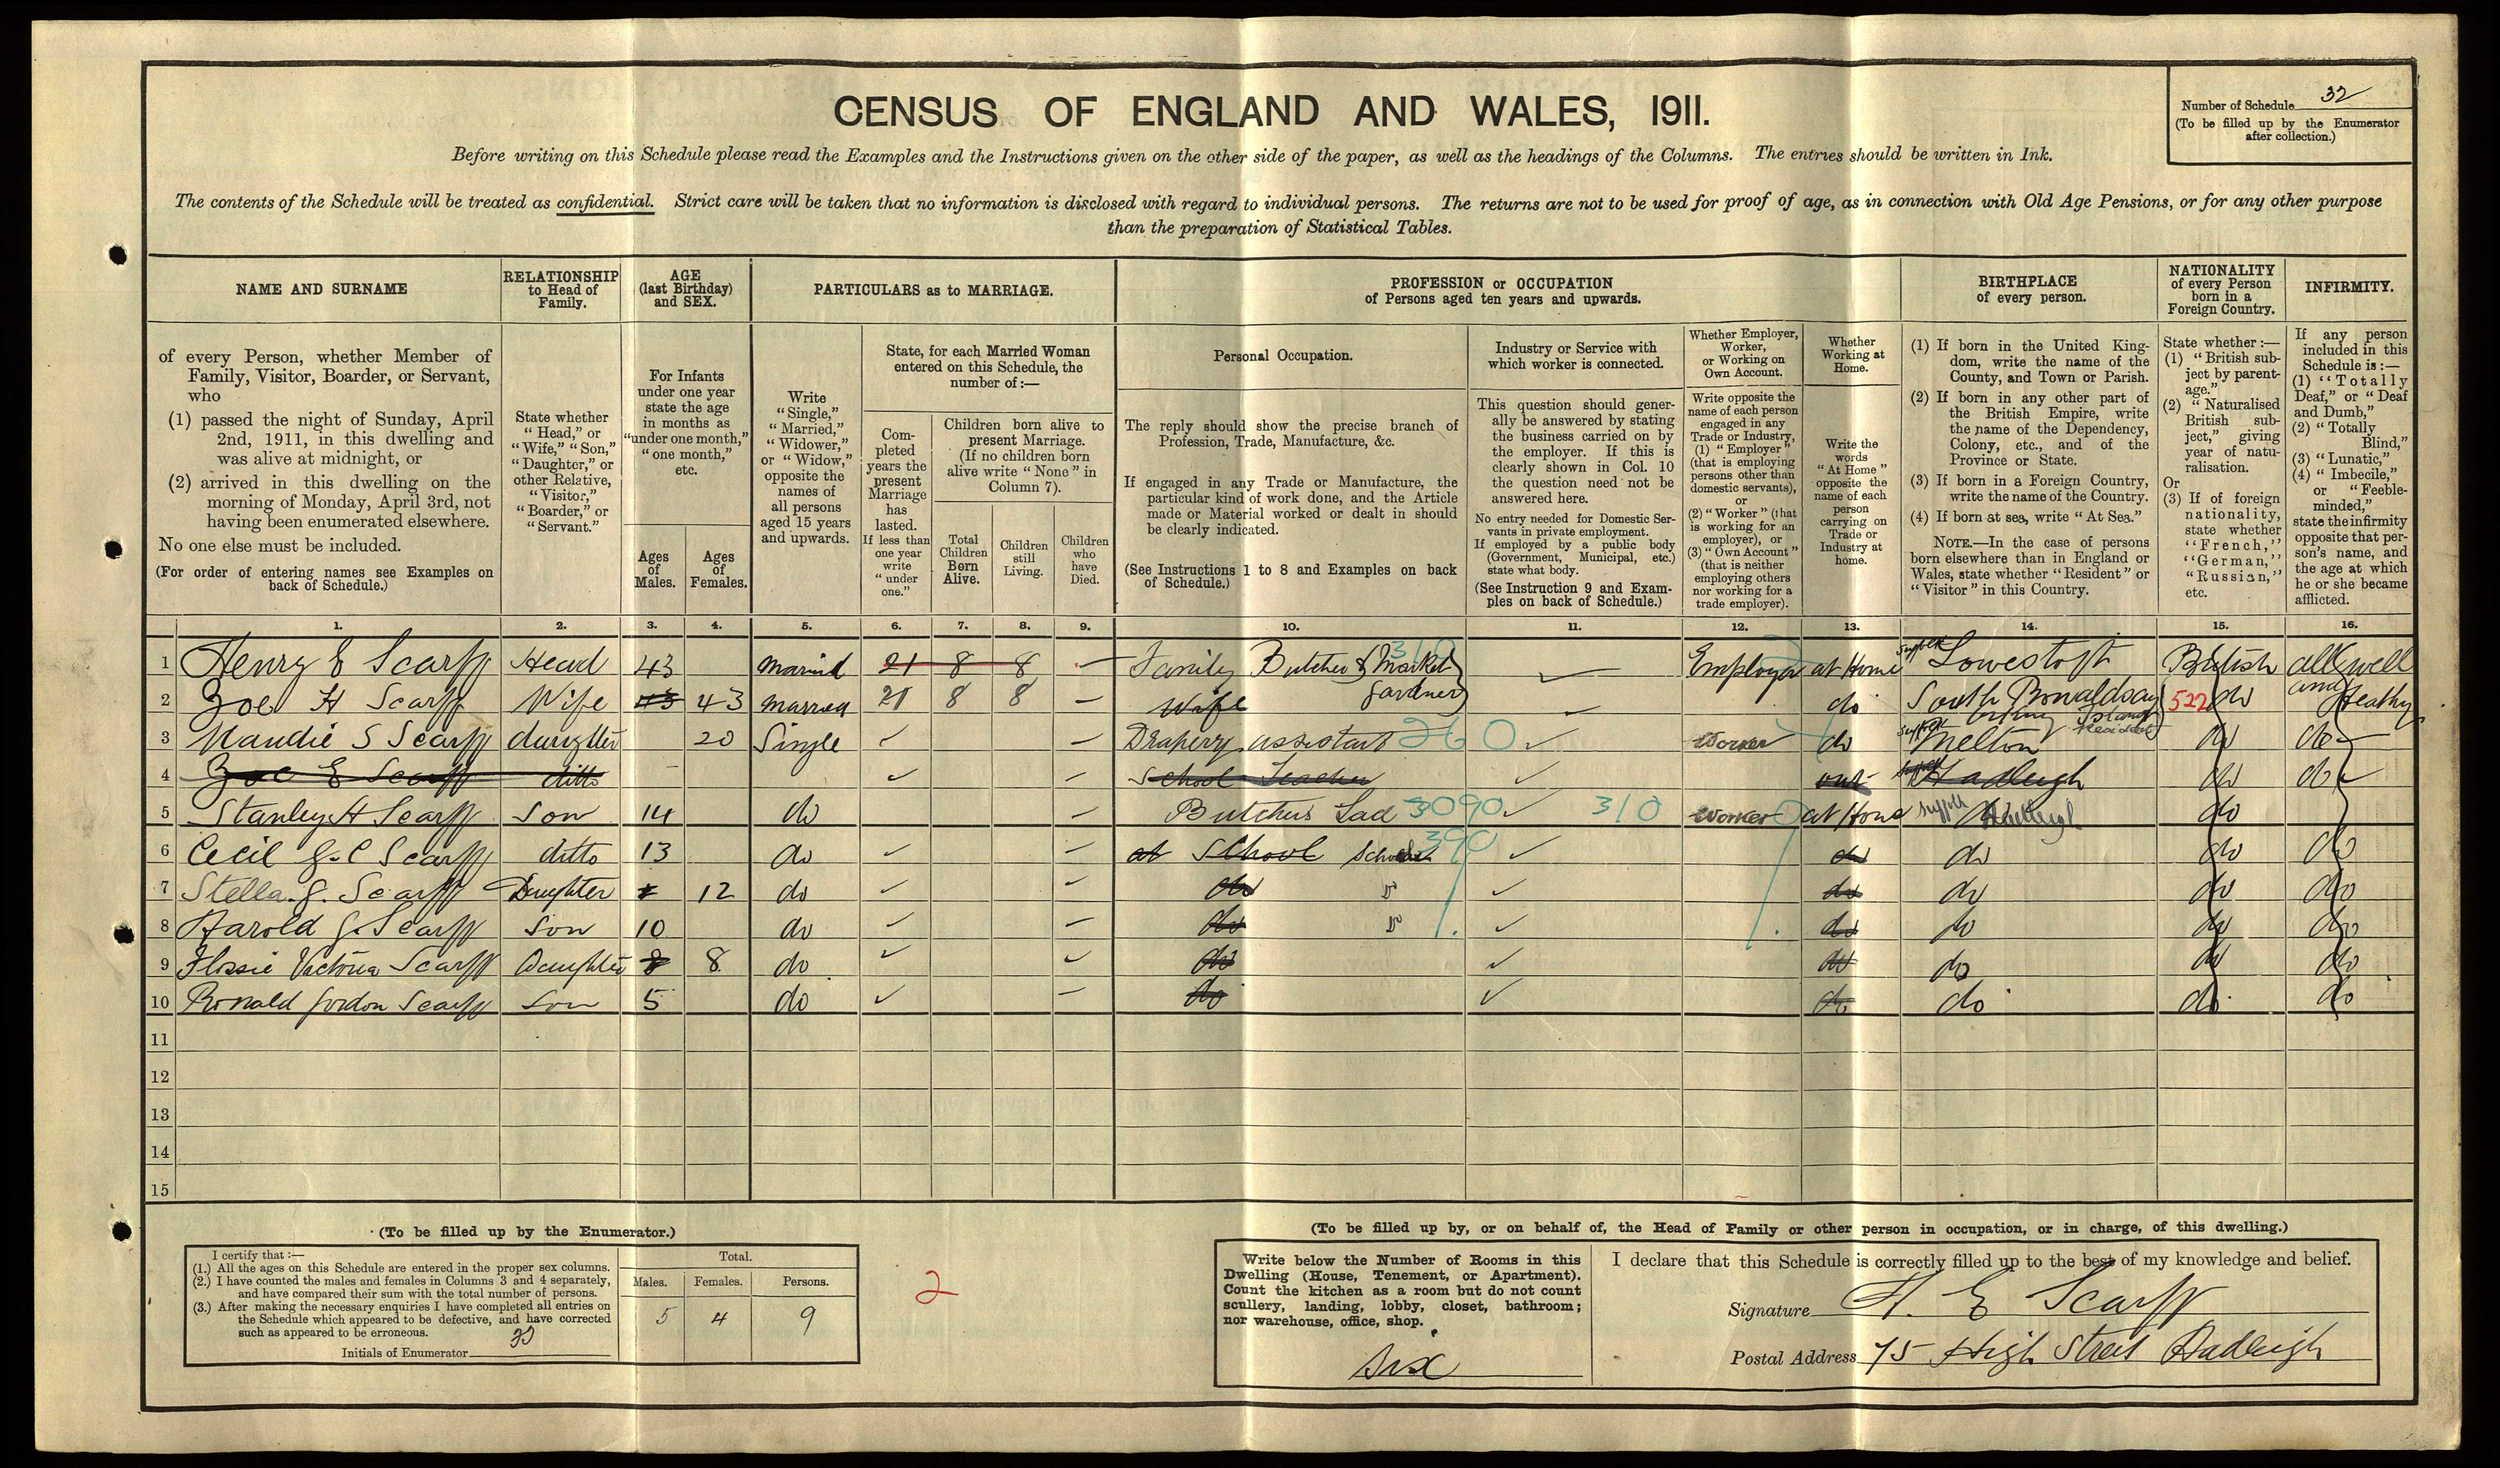 anc 1911 census Scarff.jpg